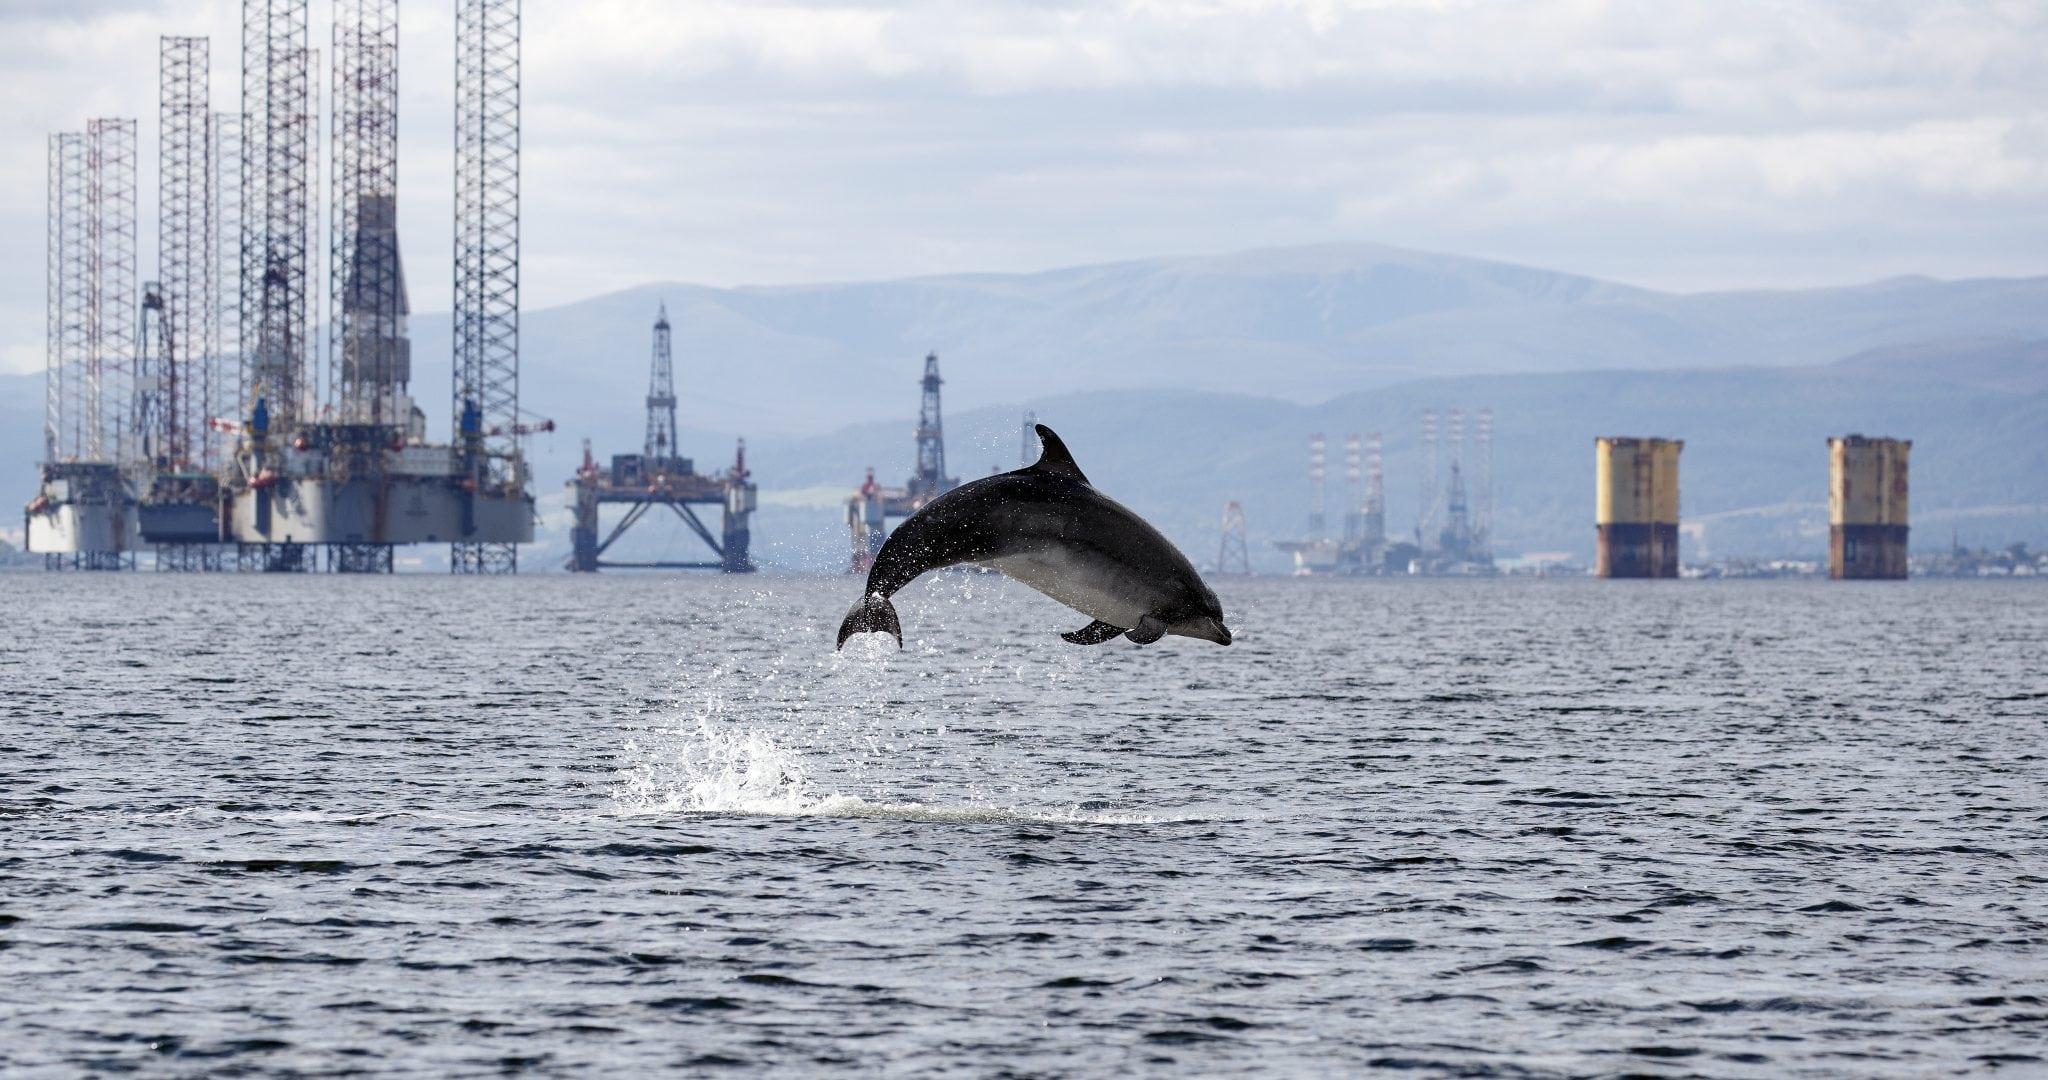 Ölplattform Delfin